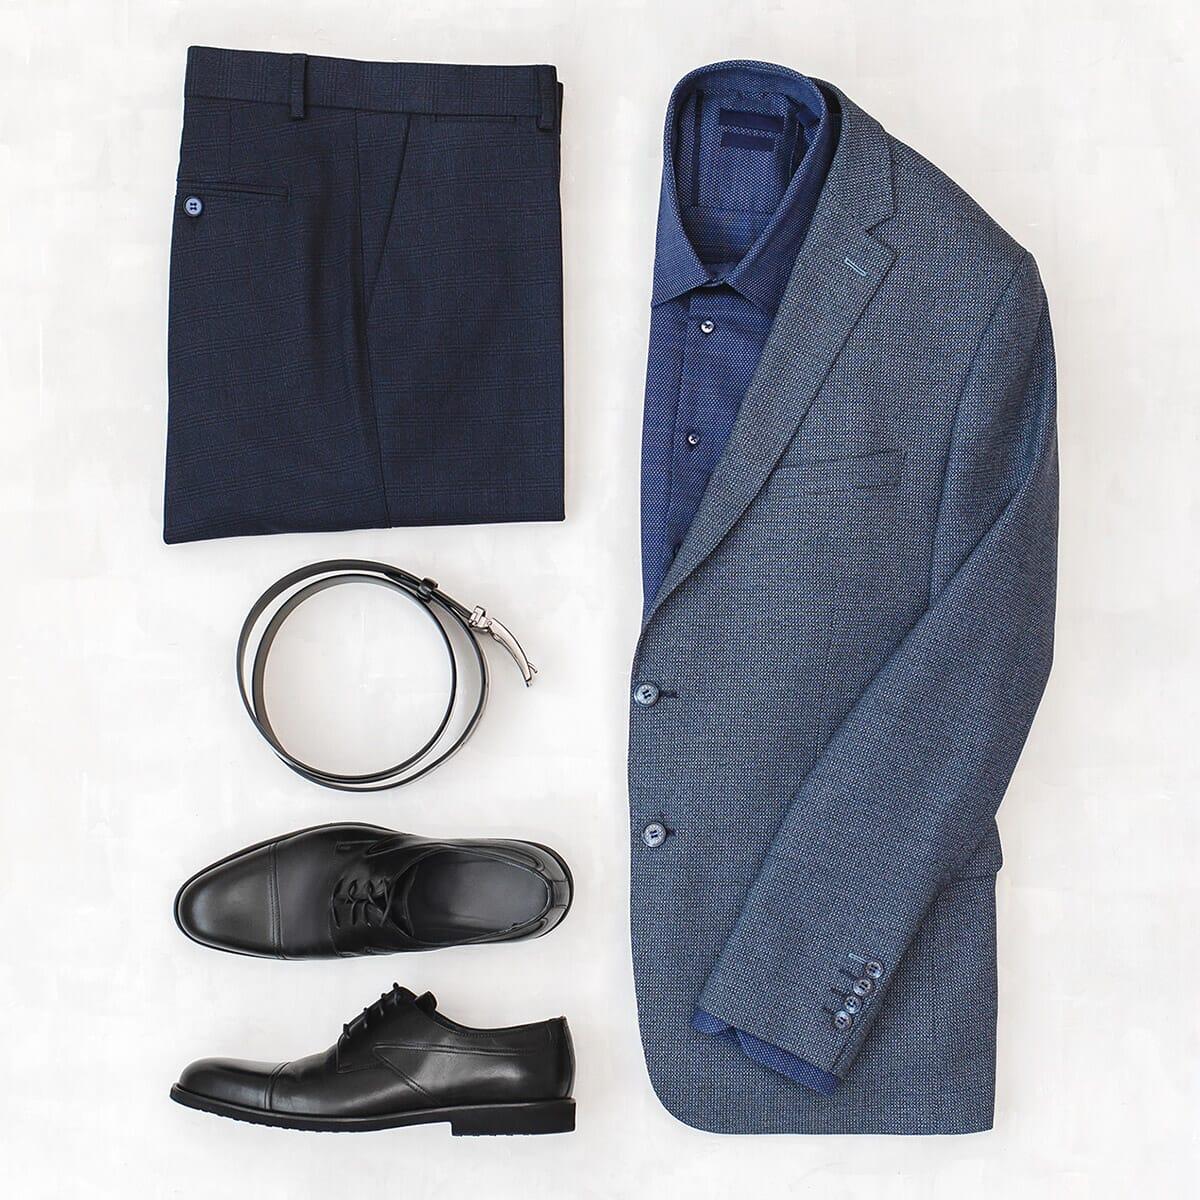 men's business dinner attire